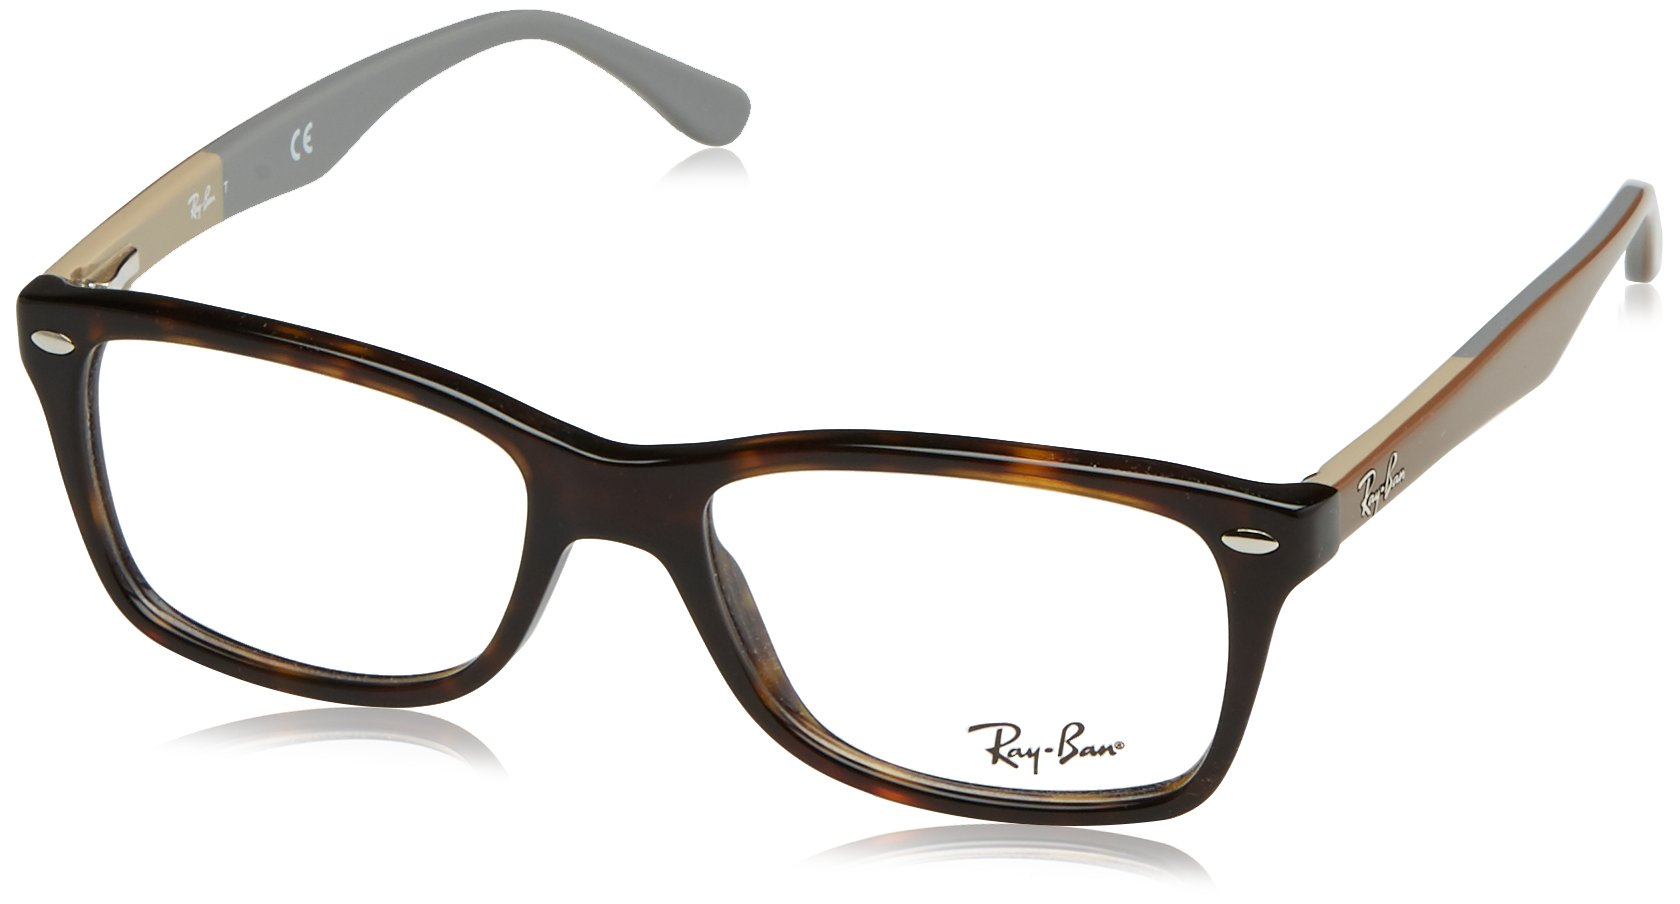 Ray-Ban Women's RX5228 Eyeglasses Sand Grey 55mm